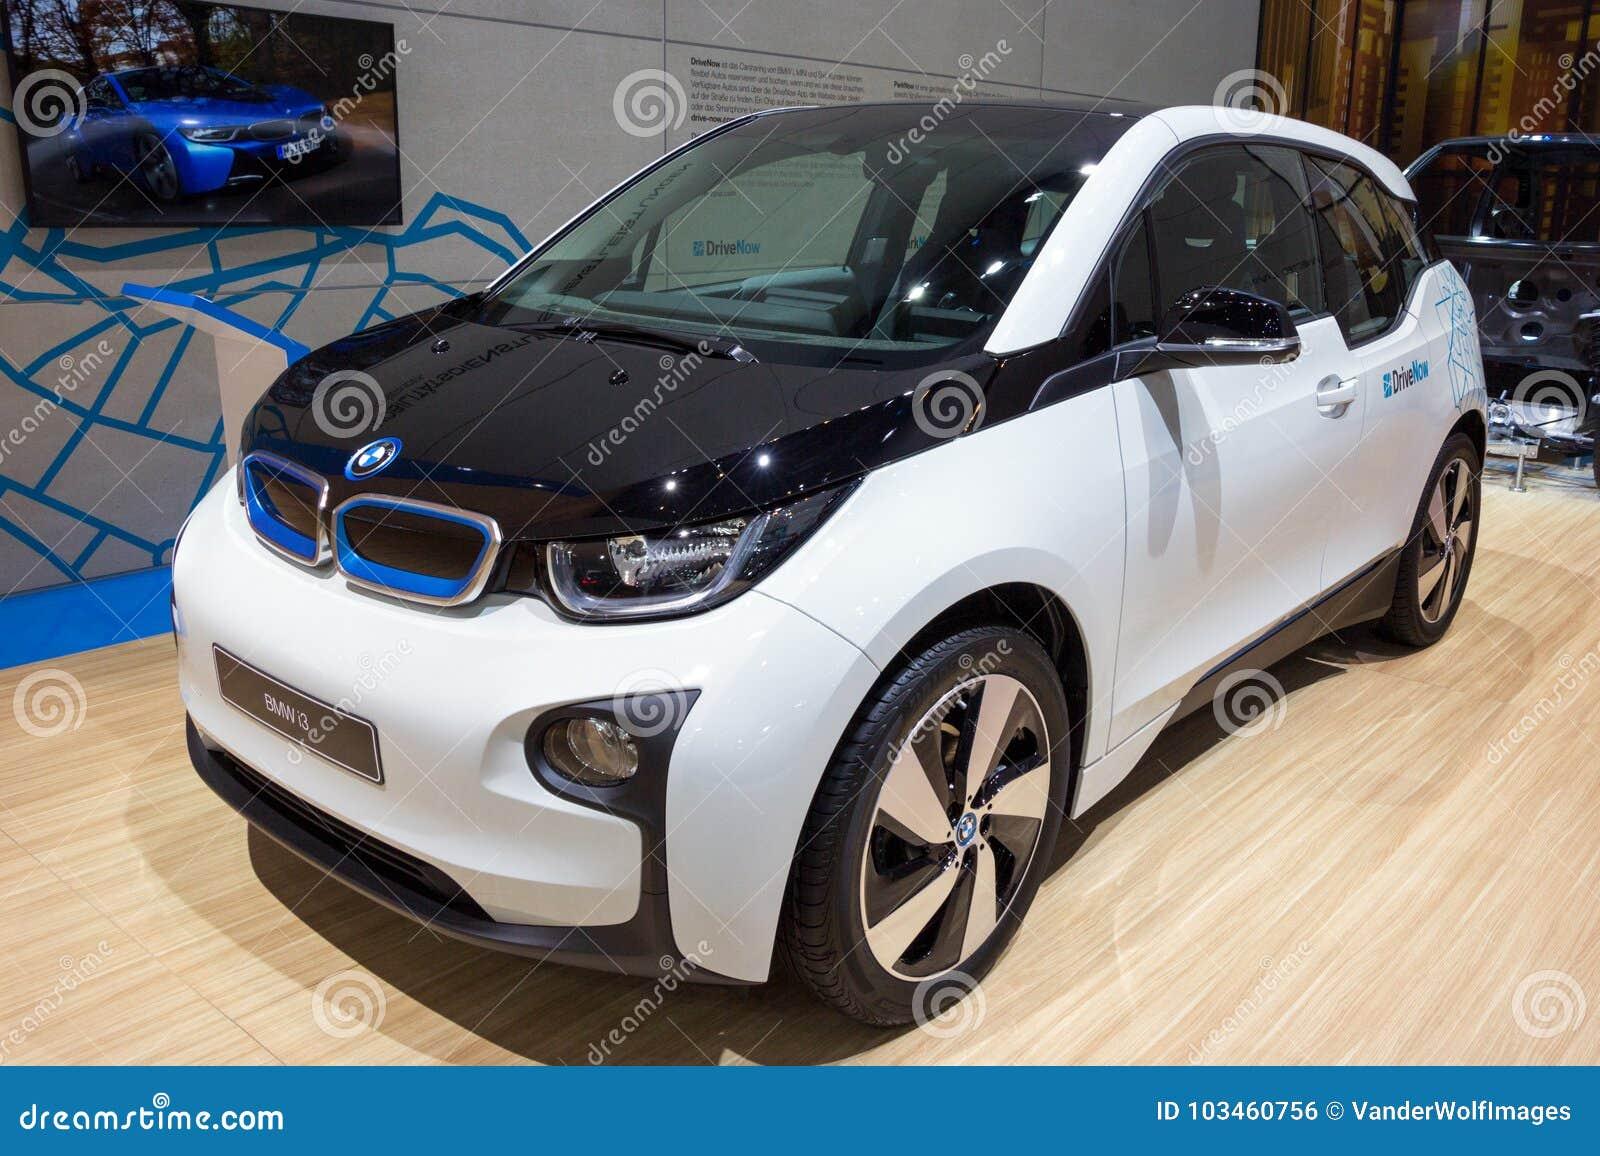 Bmw I3 Electric Car Editorial Photo Image Of Show Autoshow 103460756